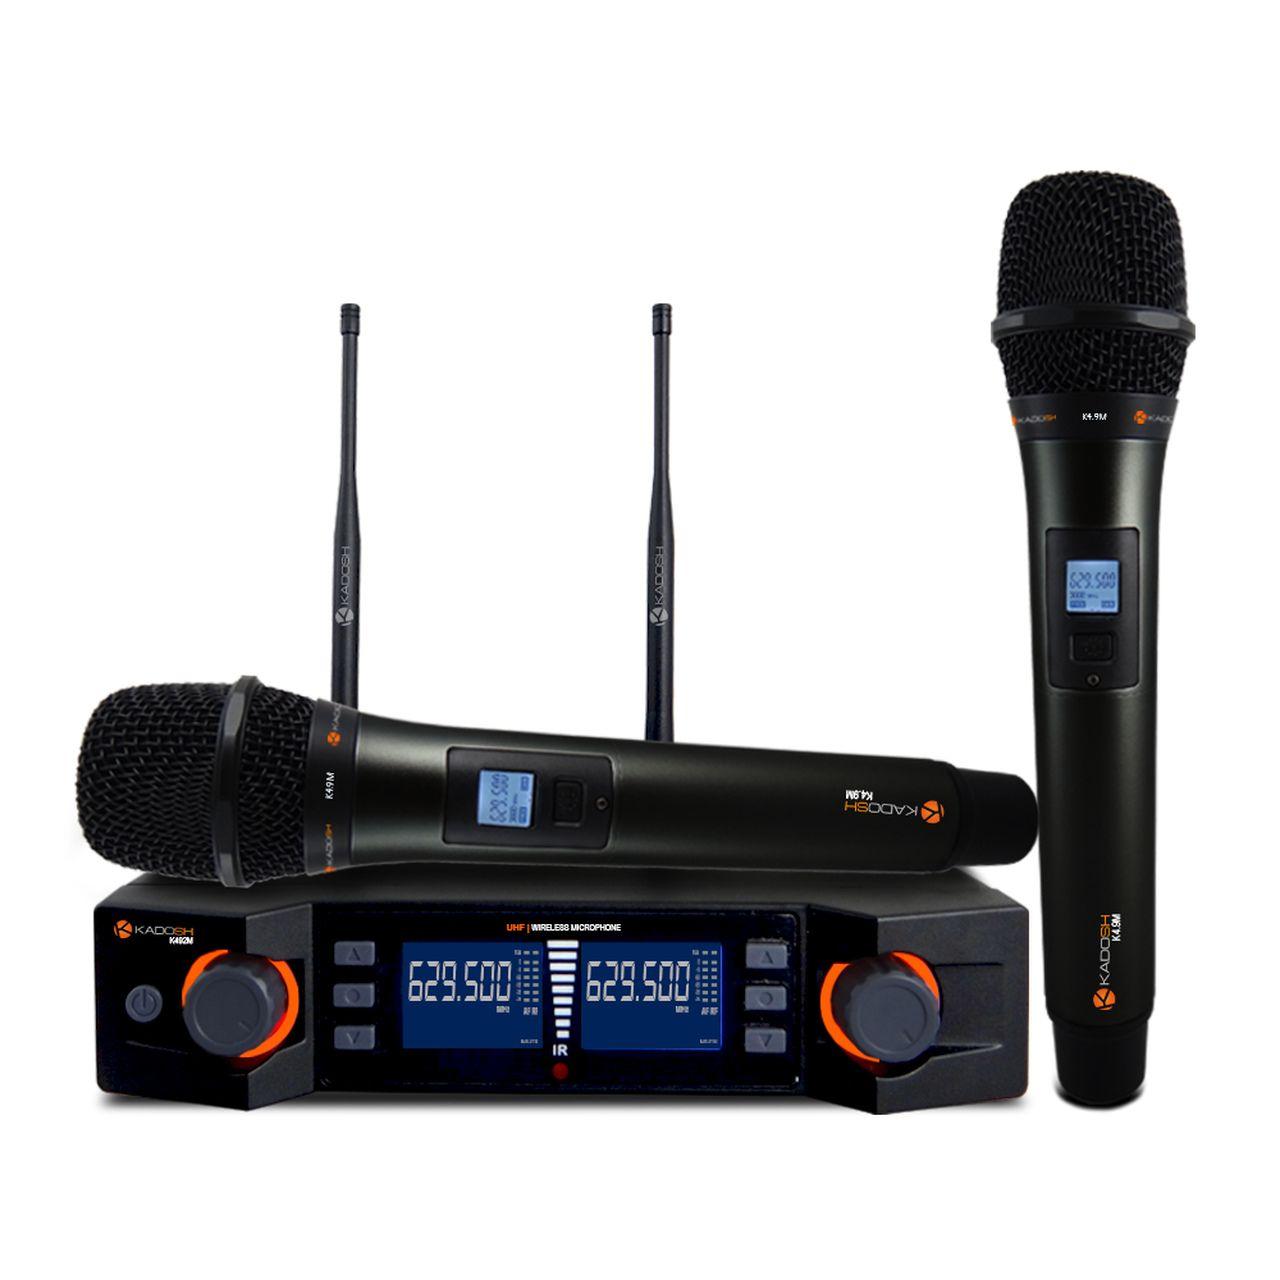 Microfone s/fio Kadosh K-492M